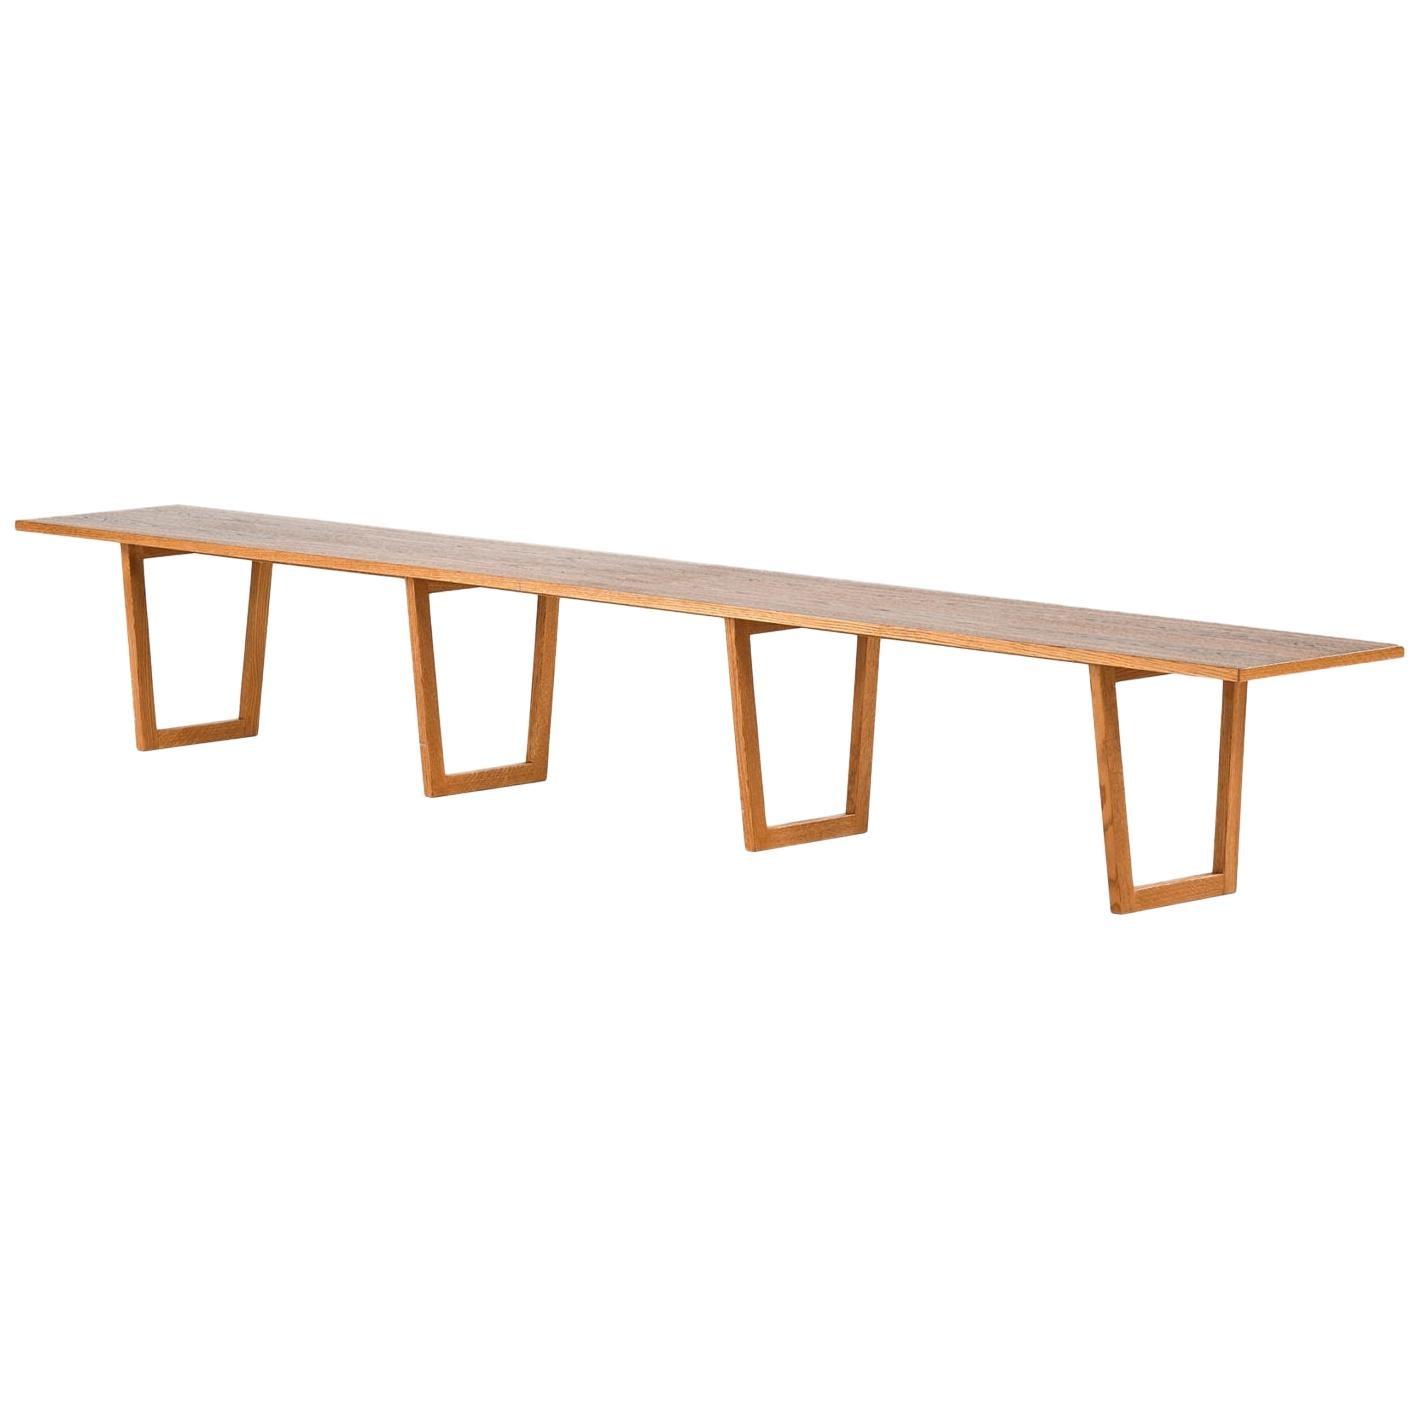 Kurt Østervig Side Table or Bench Produced by Jason Møbler in Denmark